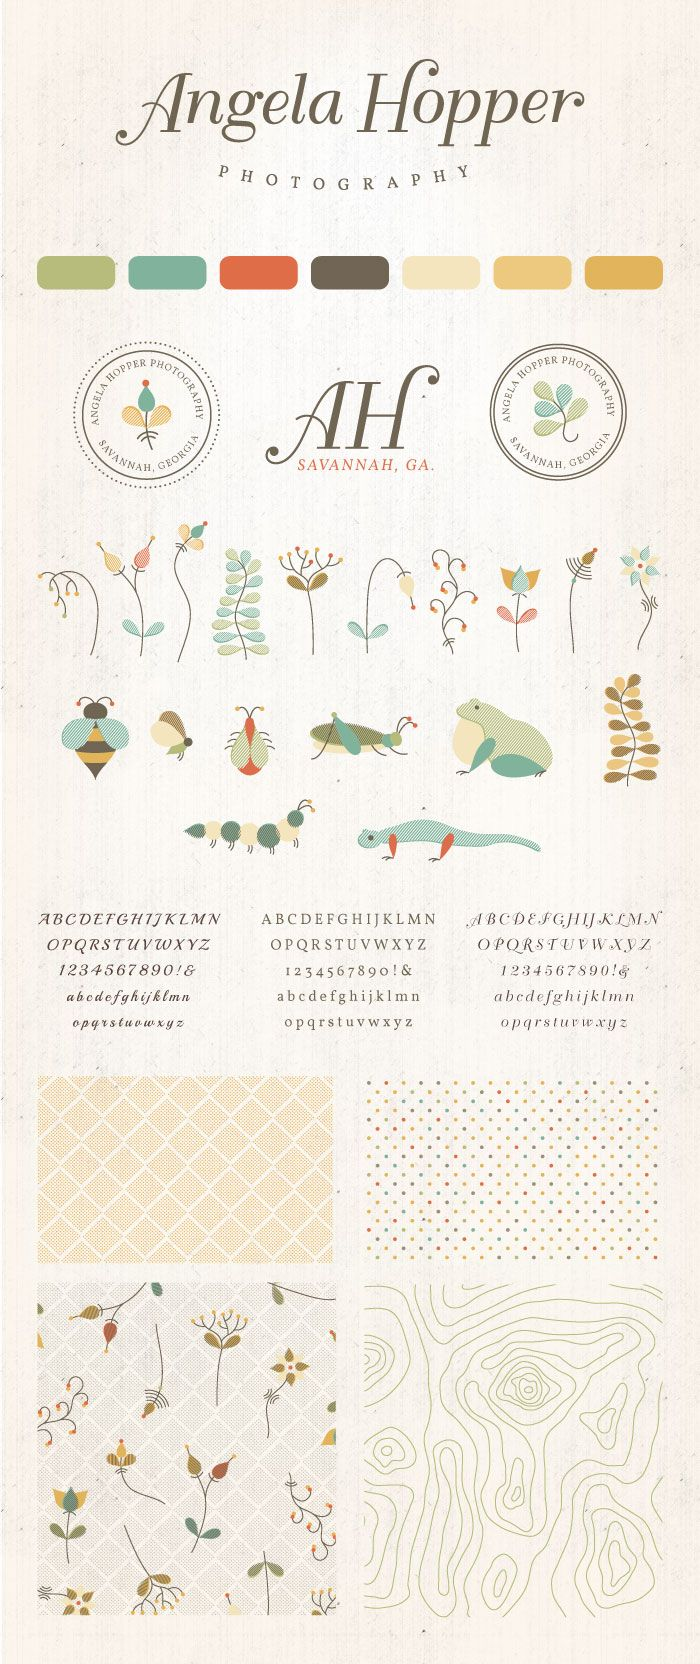 Small Business Branding & Identity Design for Angela Hopper Photography- organic illustrations